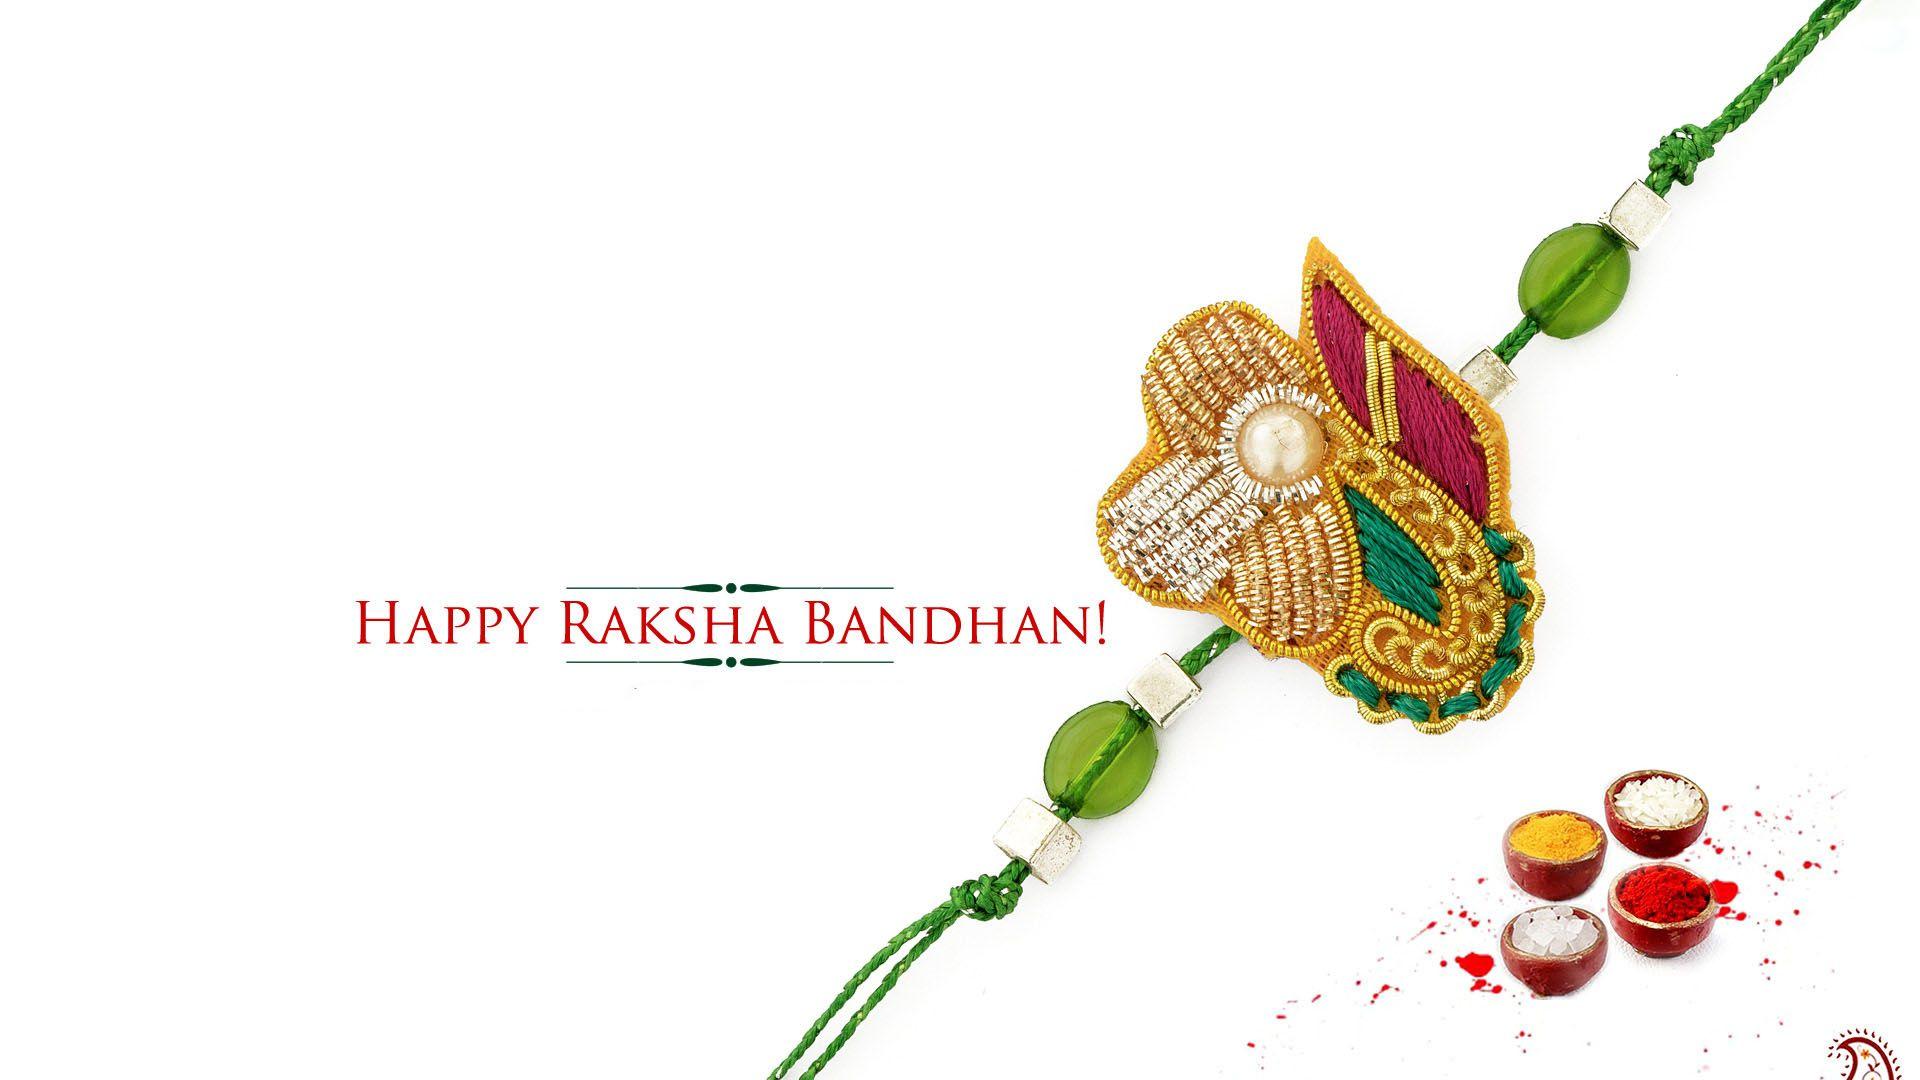 Raksha Bandhan Wallpaper Downloads For Free Megahdscreen